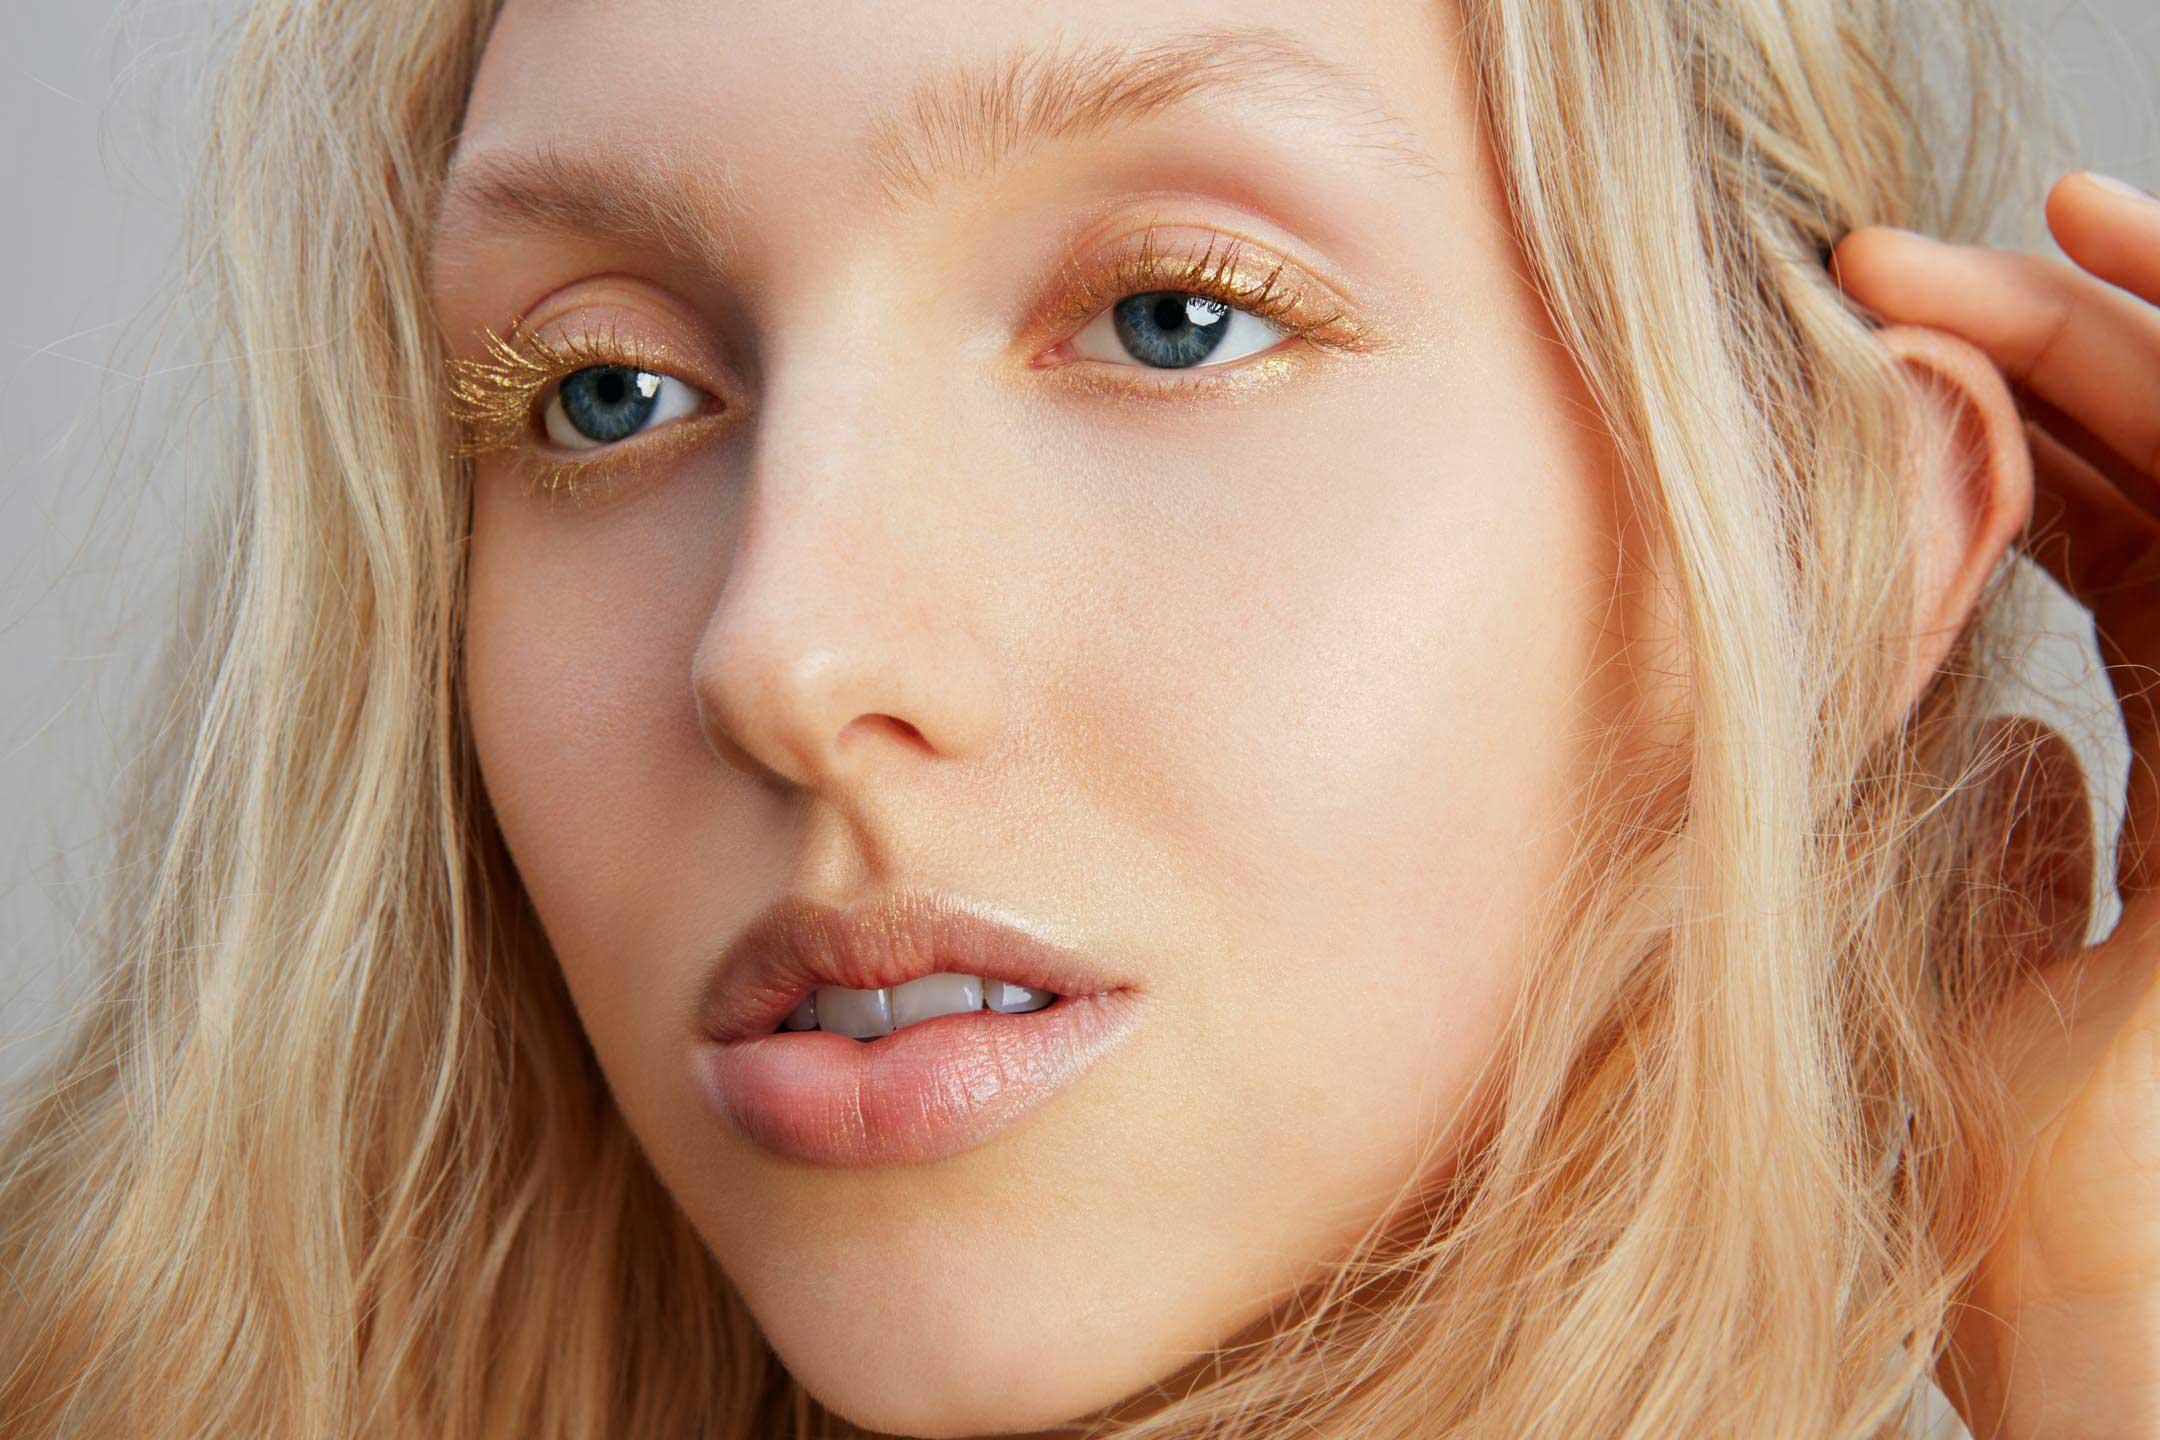 Natural Beauty Story - Model Delilah Koch I Greg Sorensen I Fashion & Beauty Photographer I NYC